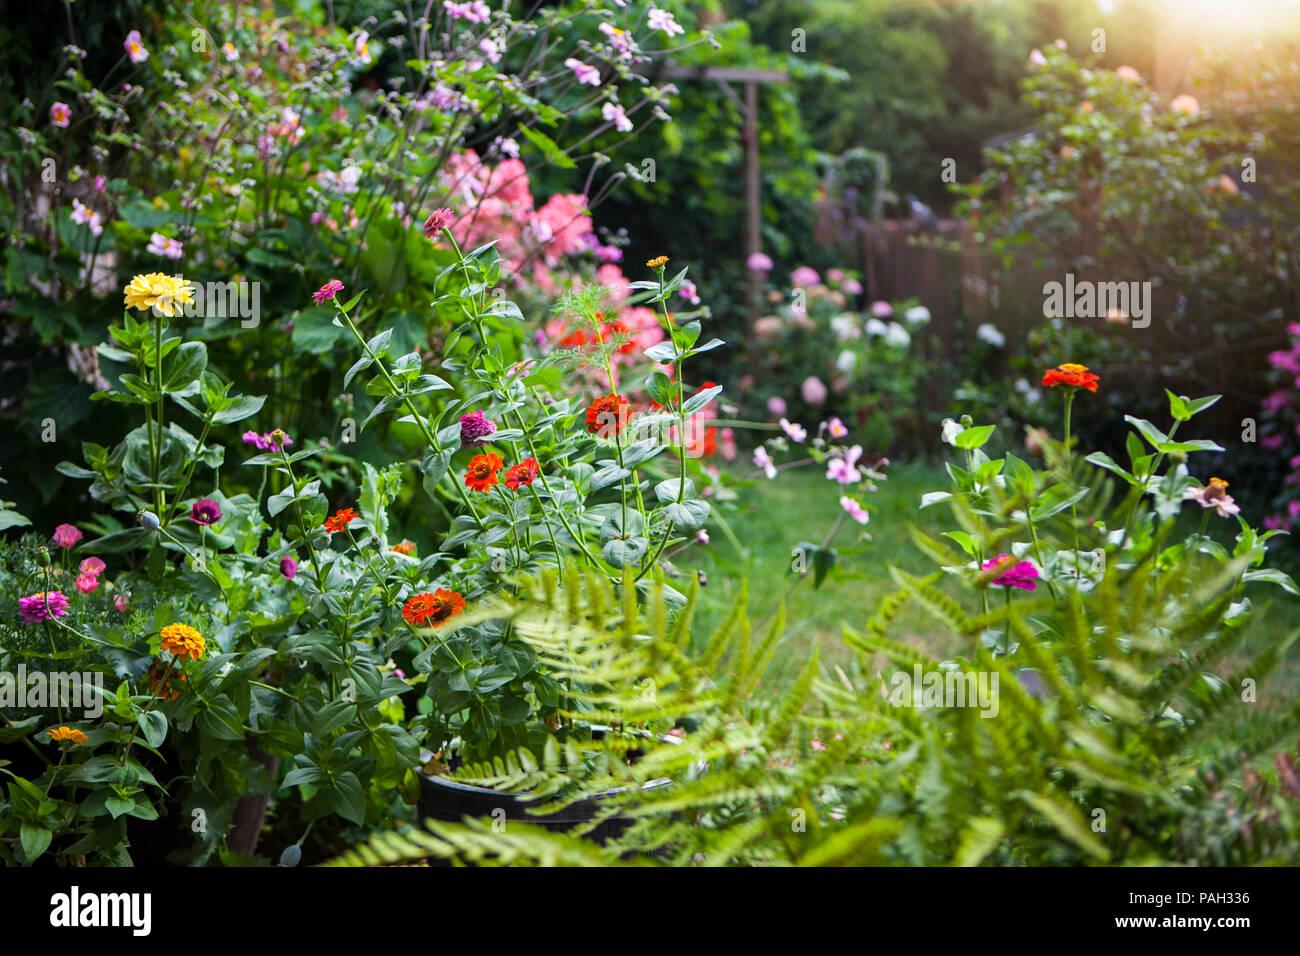 Giardino in estate in piena fioritura Foto Stock